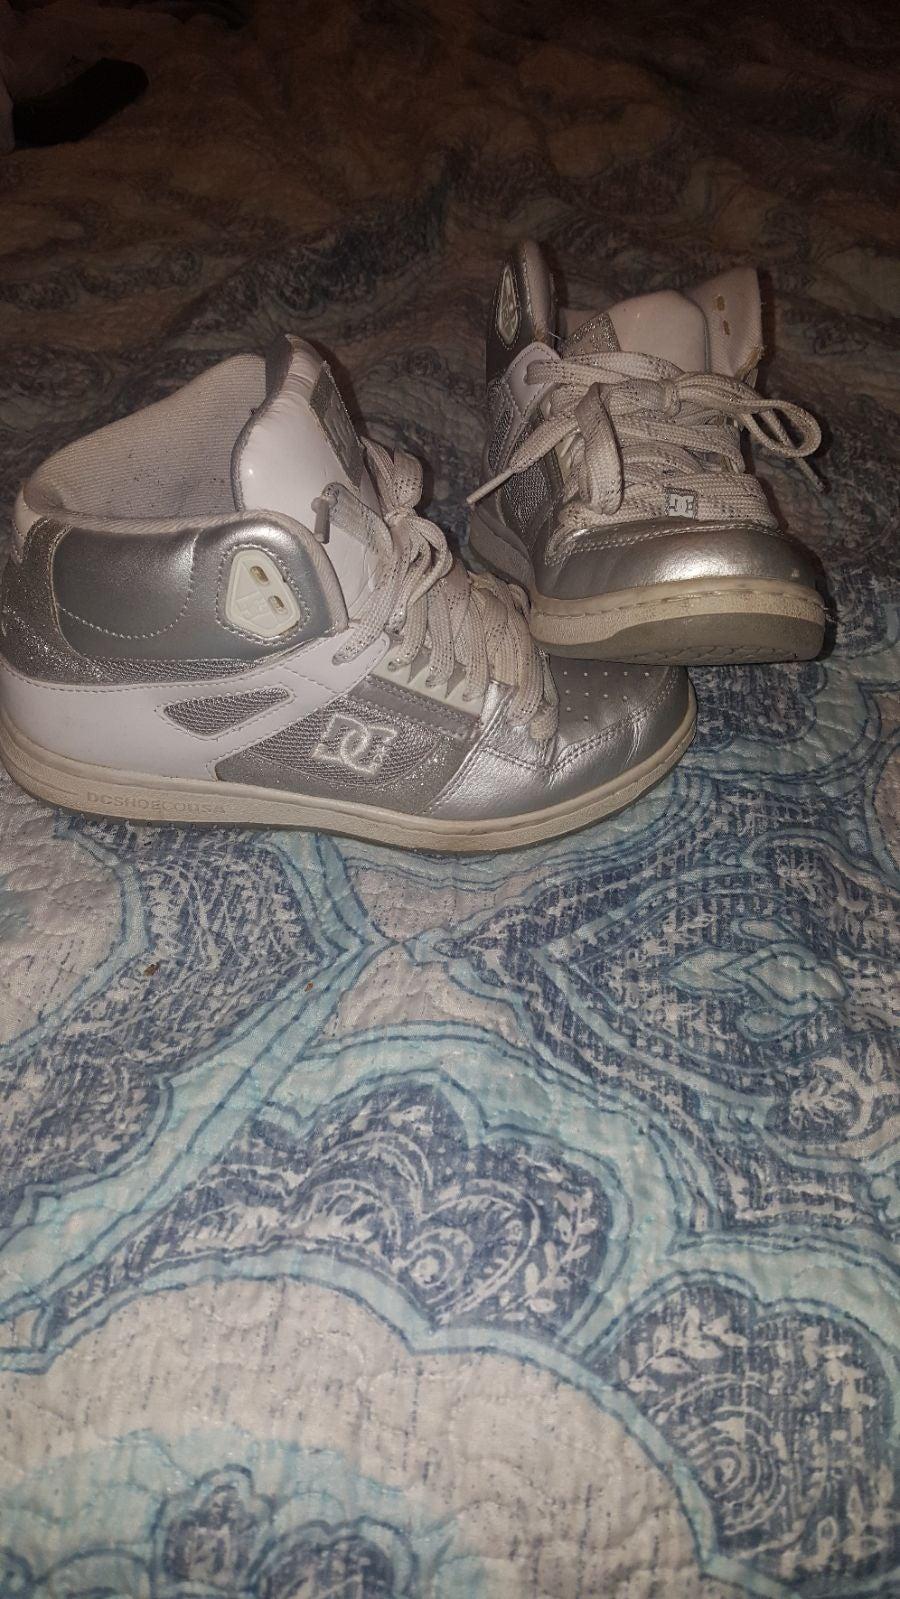 DC high top sneakers